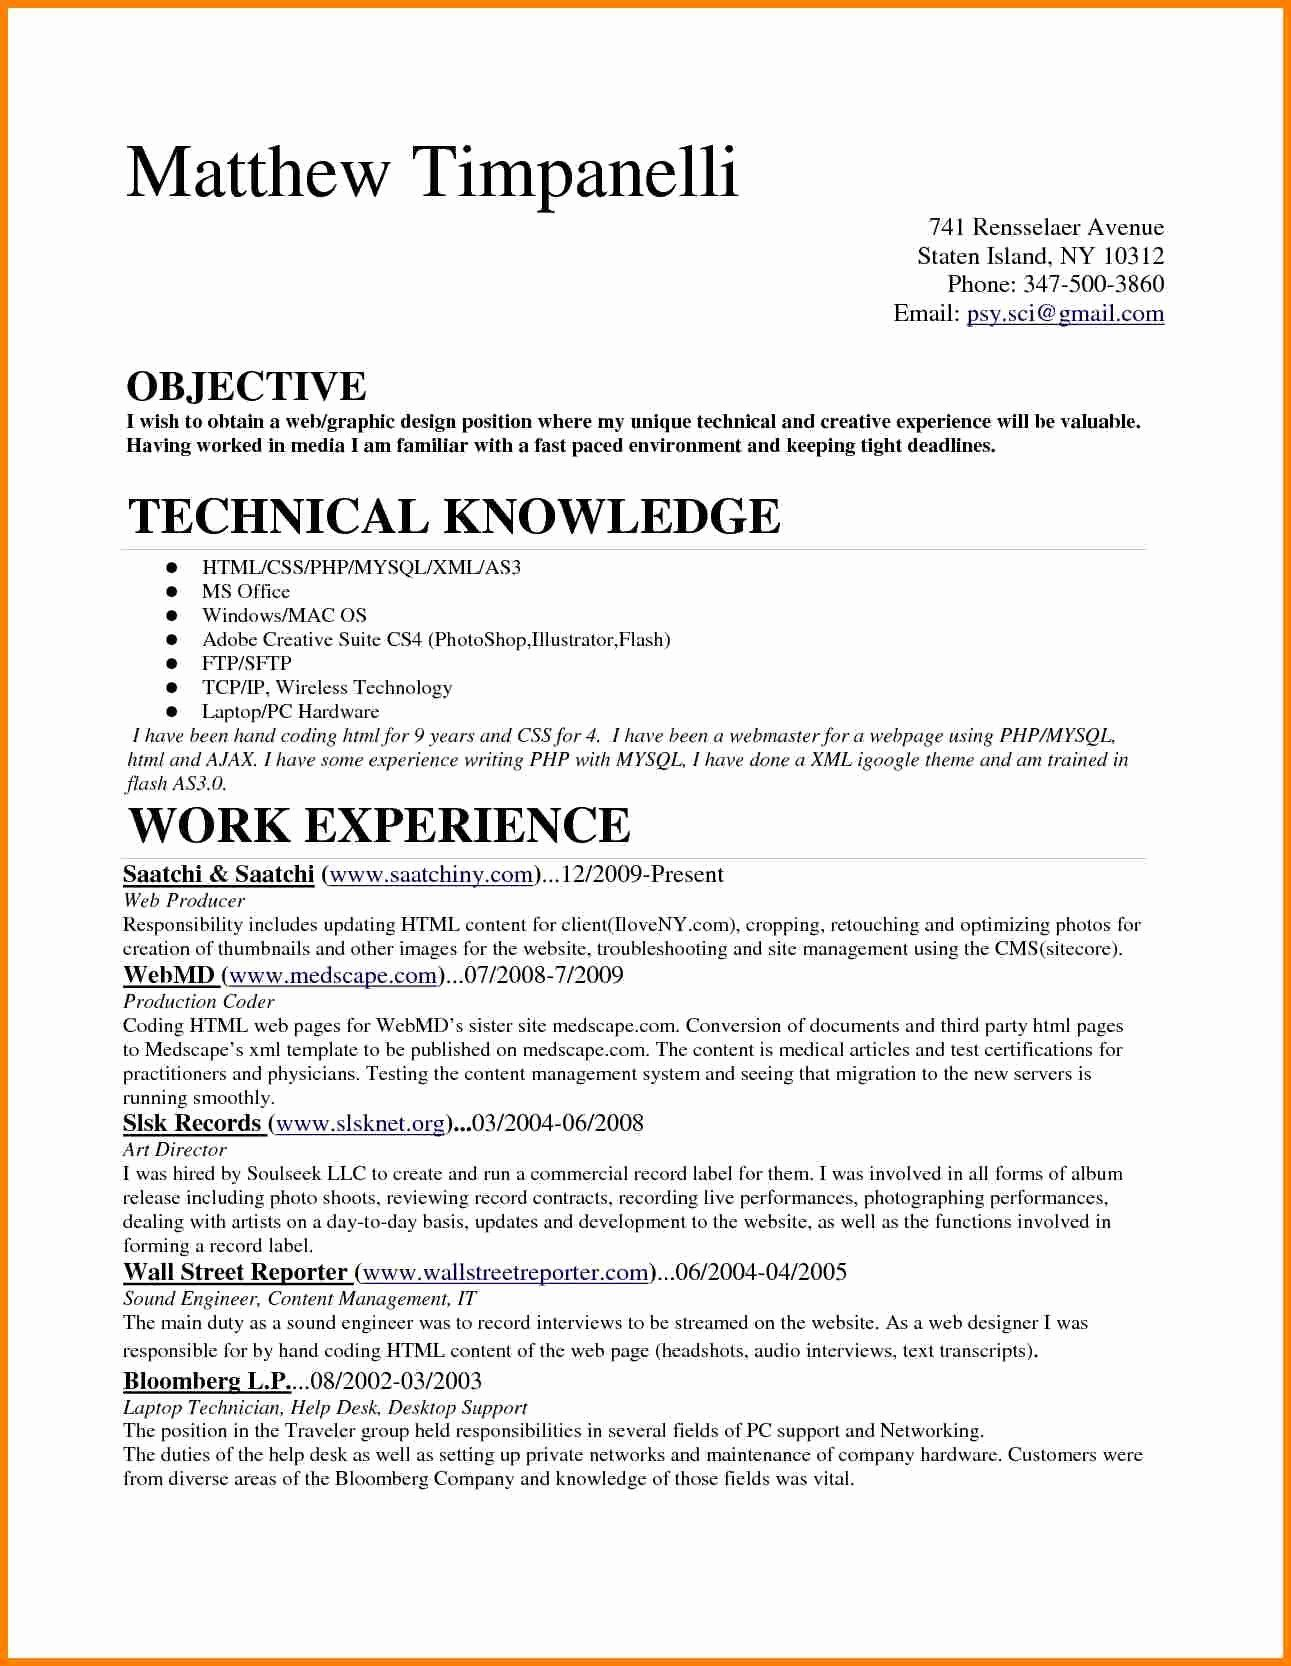 Medical Billing Resume Example Unique 7 Medical Billing And Coding Resume Examples Medical Coder Resume Resume Examples Coding Jobs